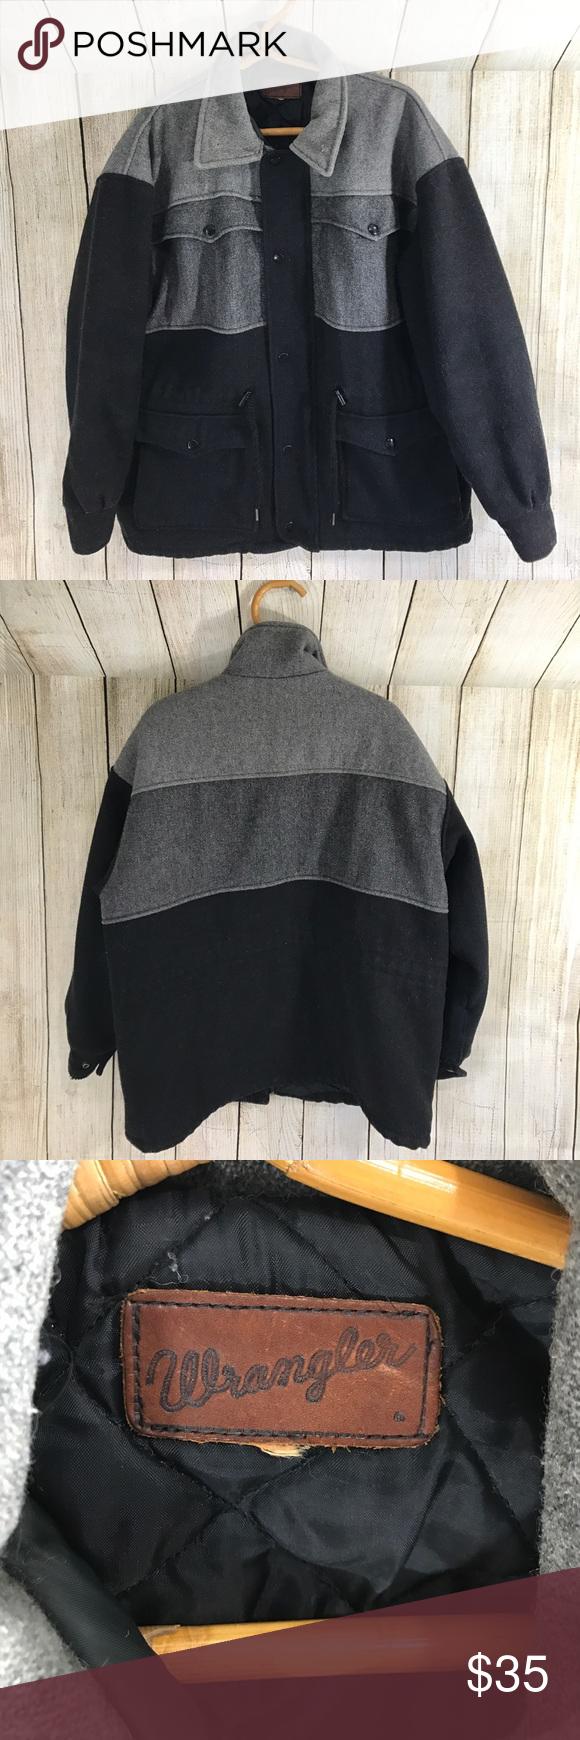 "Wrangler zip up button down coat Two tones Grey & black button down zip up coat. Lots of pockets ! Wrangler size L 29"" long Wrangler Jackets & Coats"